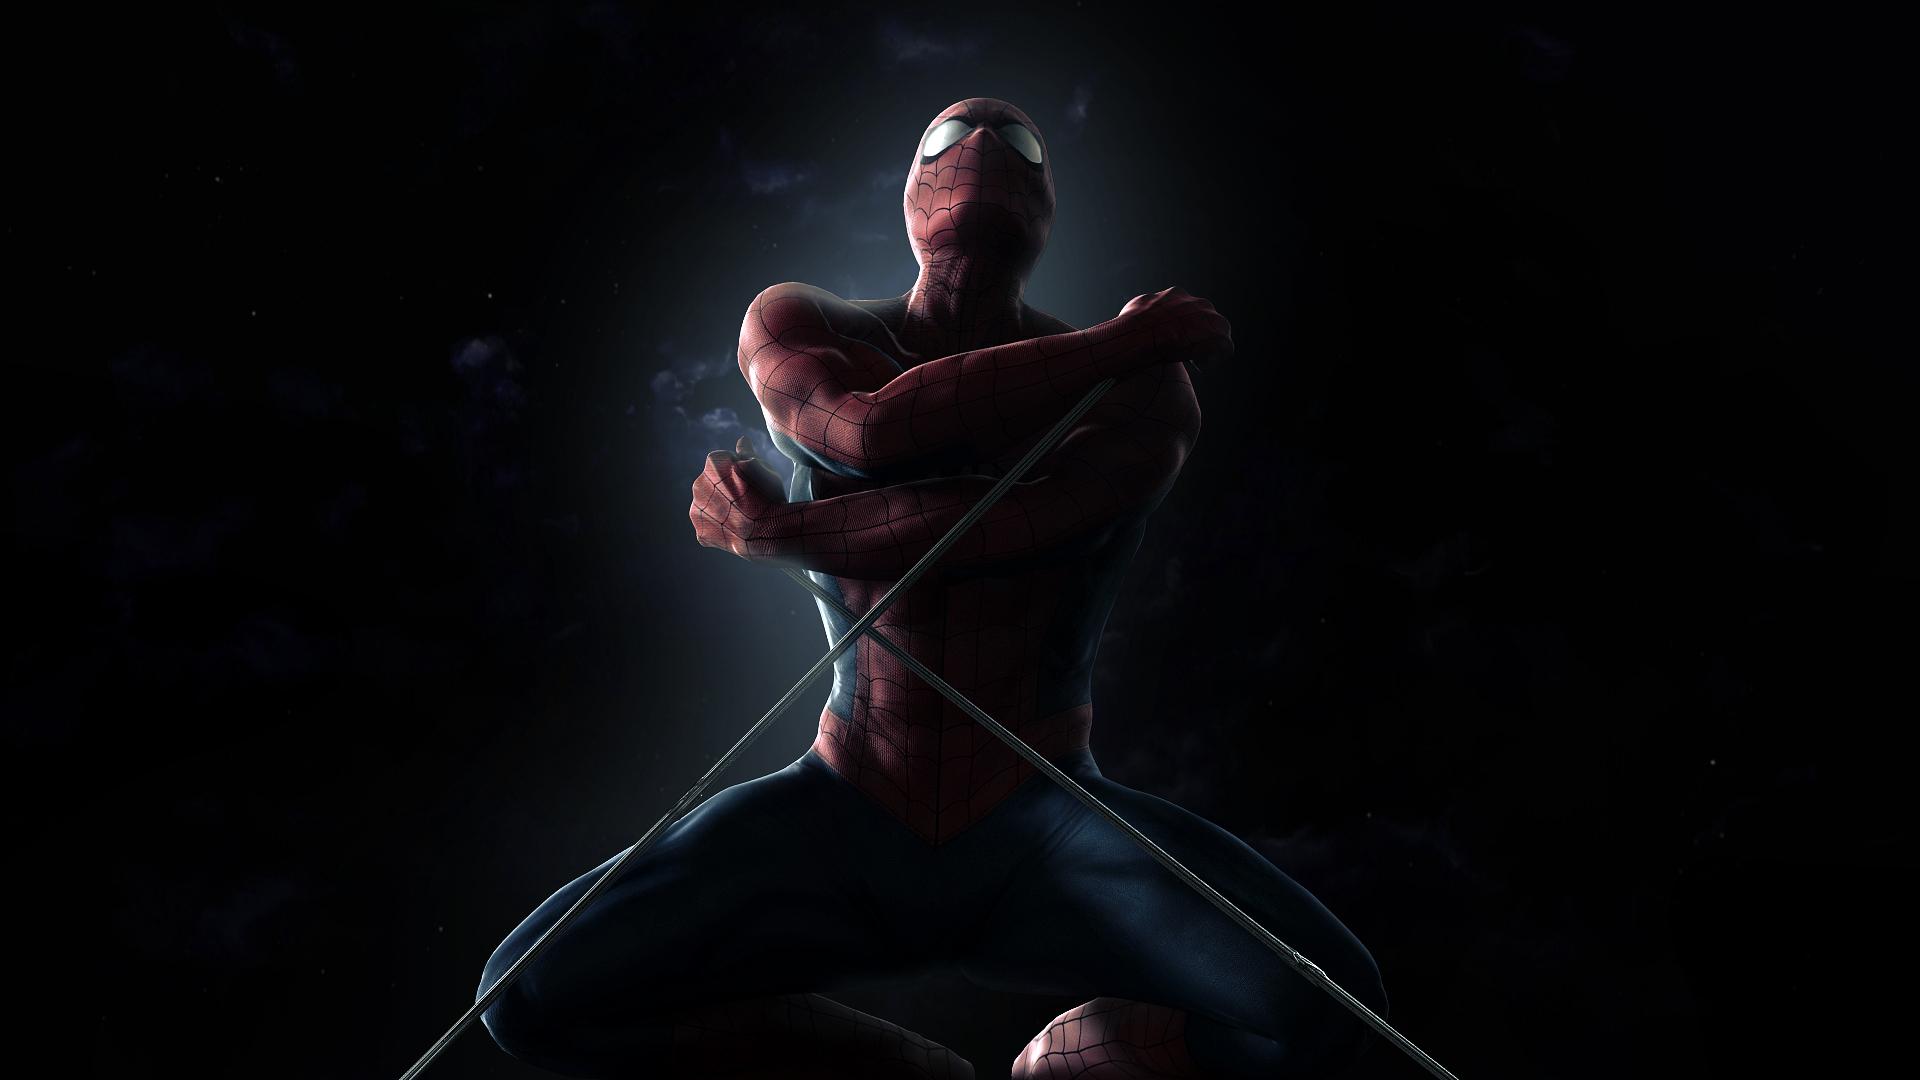 Фон комикс человек паук супергерои